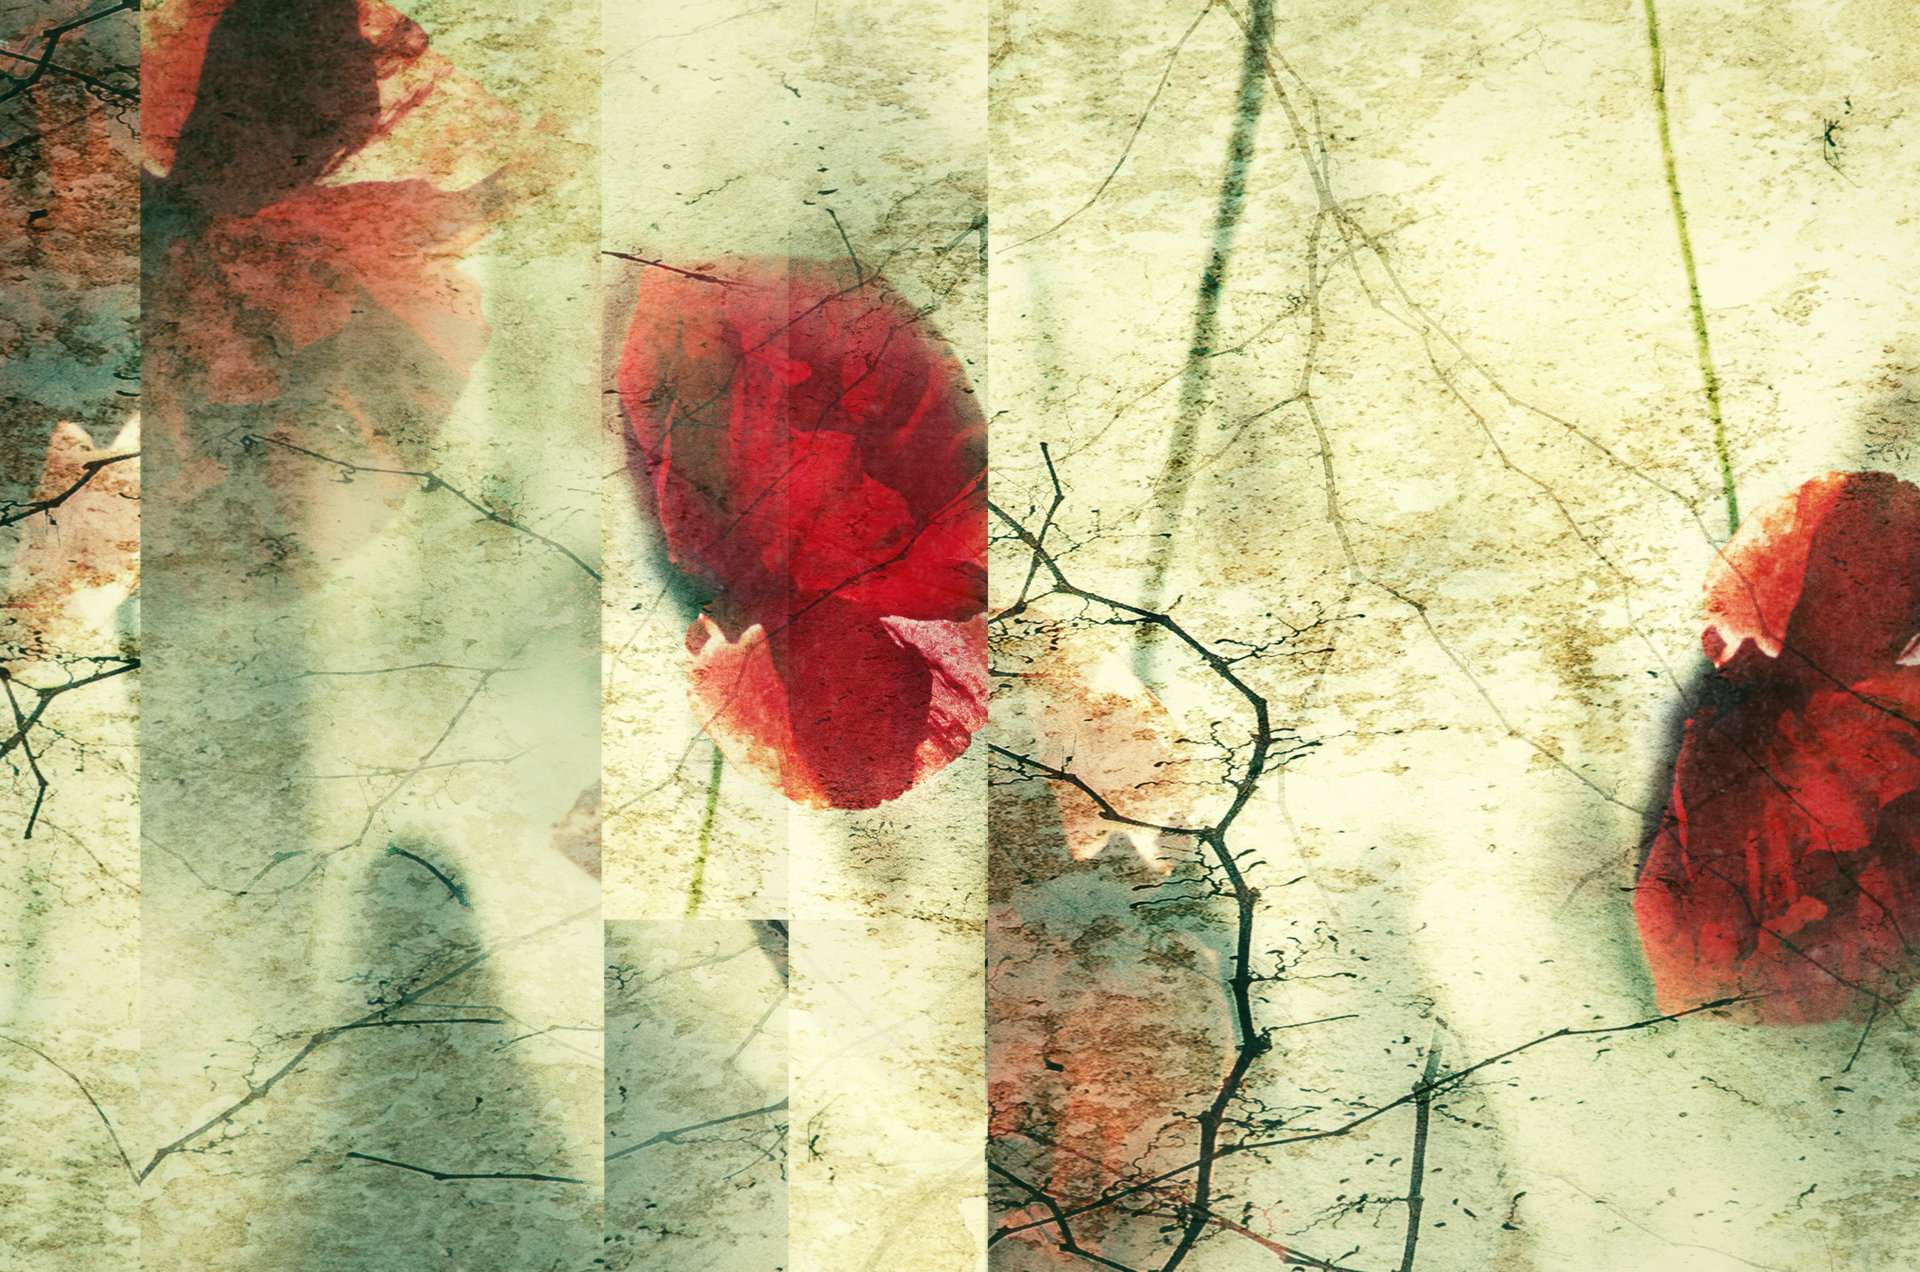 Photo in Abstract | Author desiignat | PHOTO FORUM